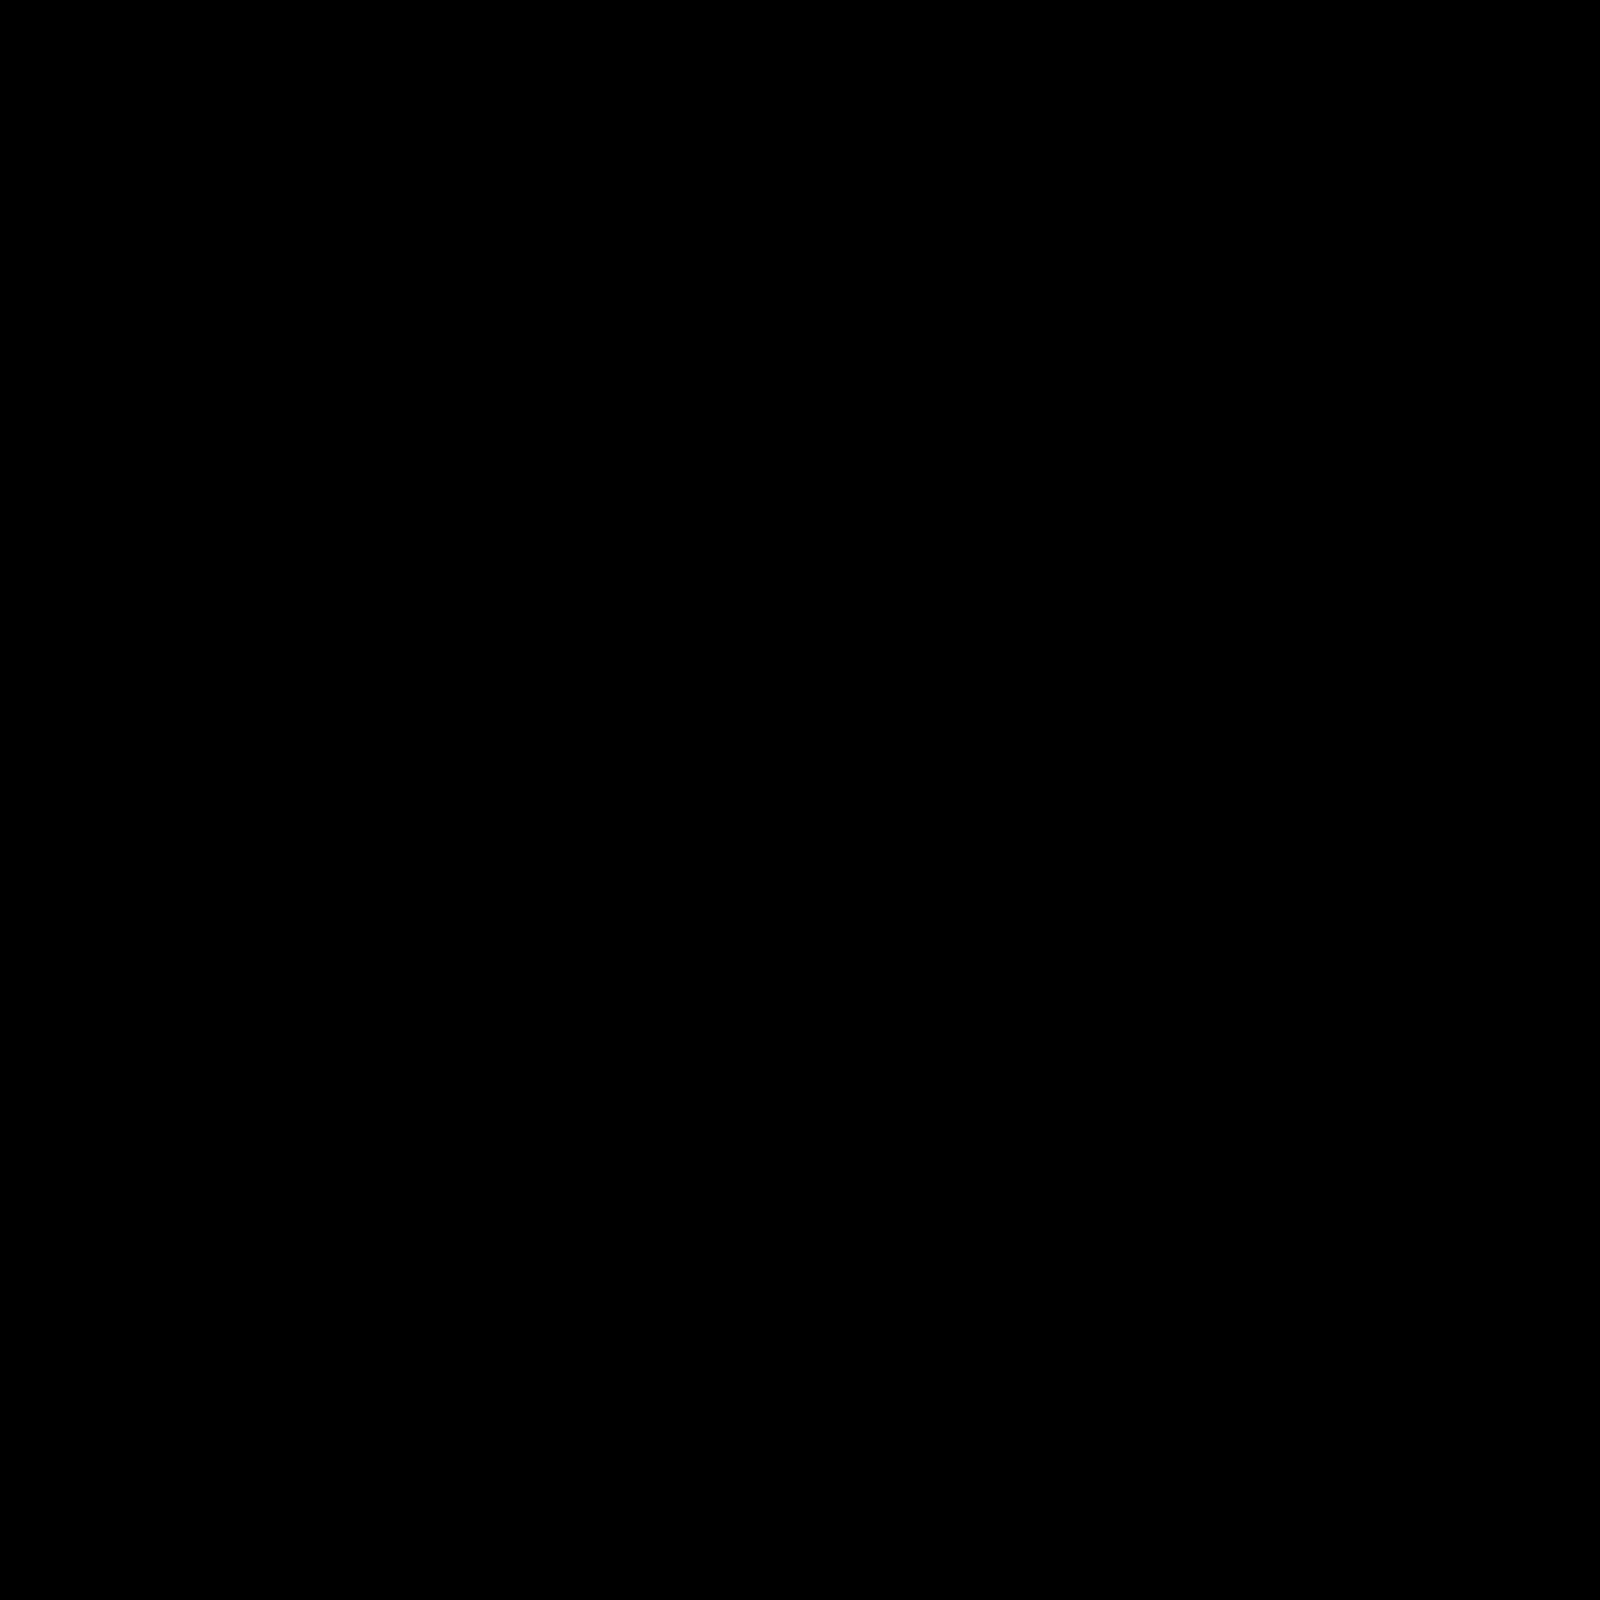 Unsplash Filled icon